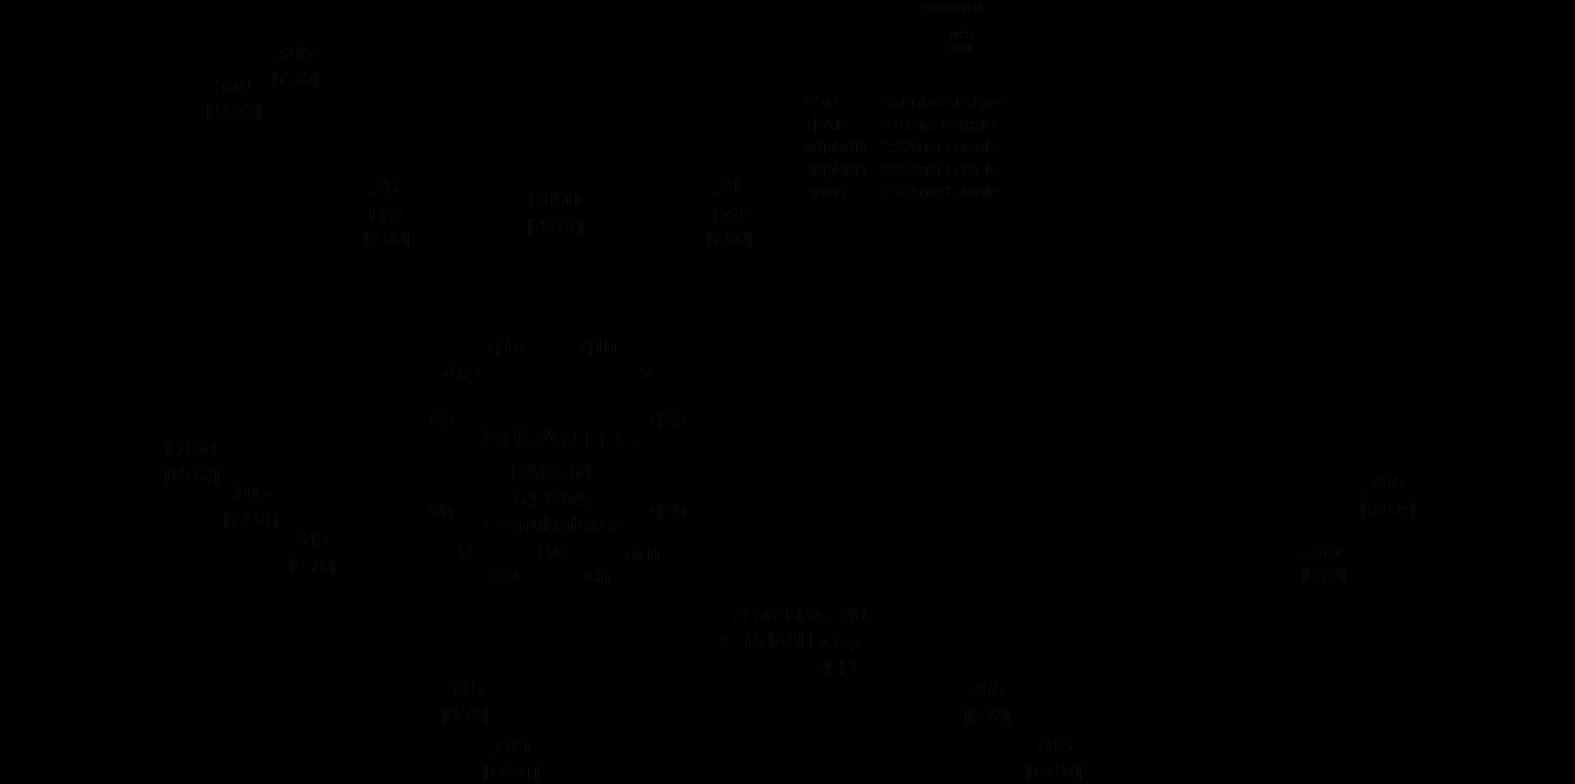 Dmx 64 High Speed Data 12 Demultiplexer Block Diagram Of Package